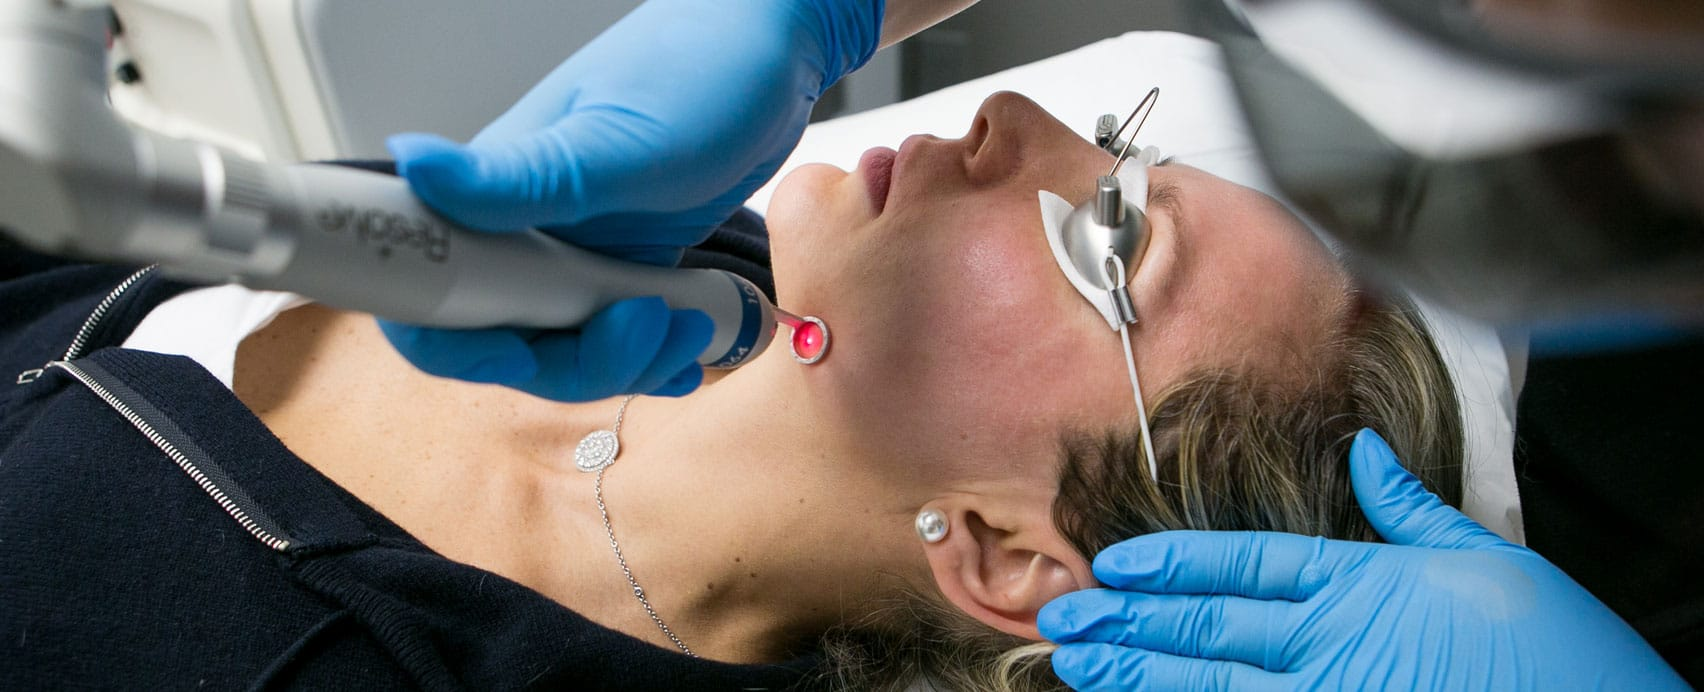 MunkMD Laser Treatments